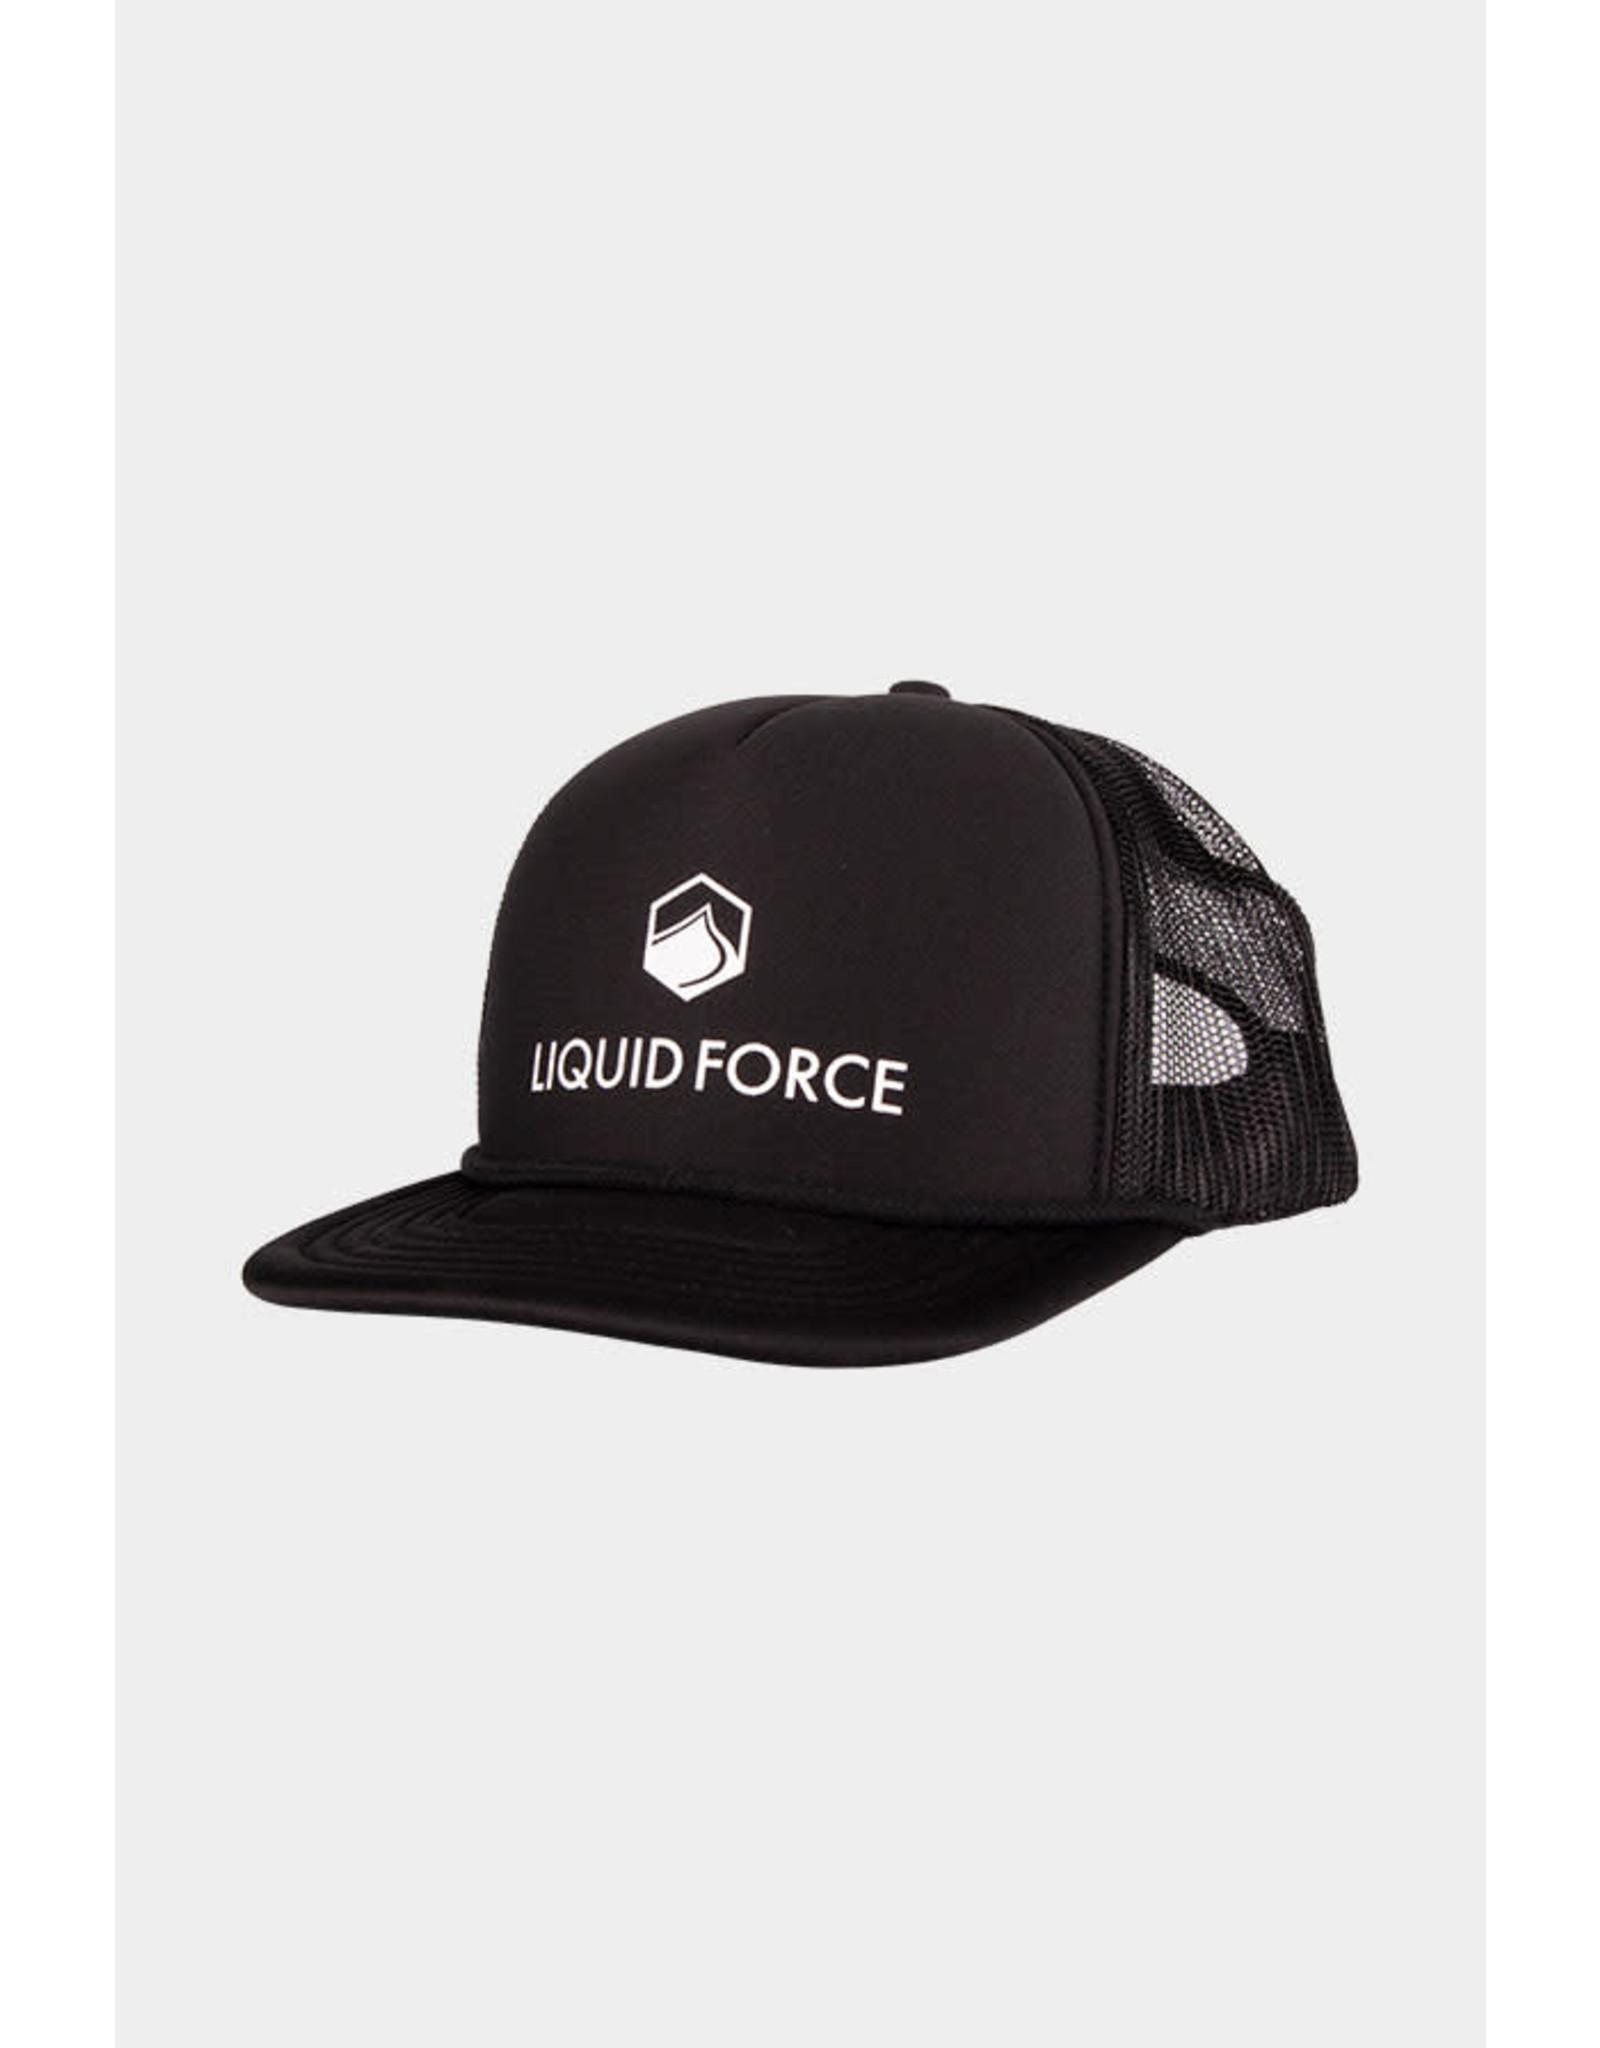 Liquid Force Corporate Logo Snapback